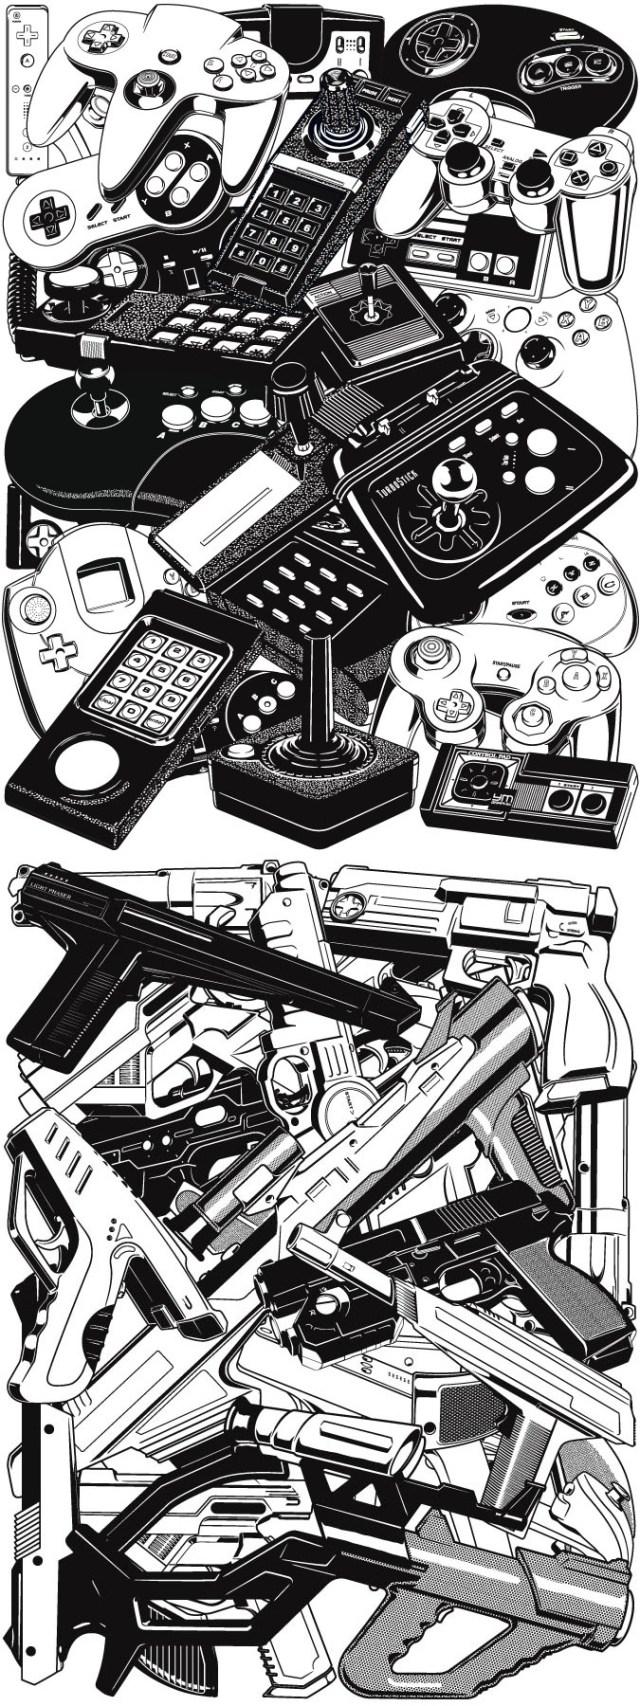 gaming-controllers-retro-1088057.jpg (588 KB)